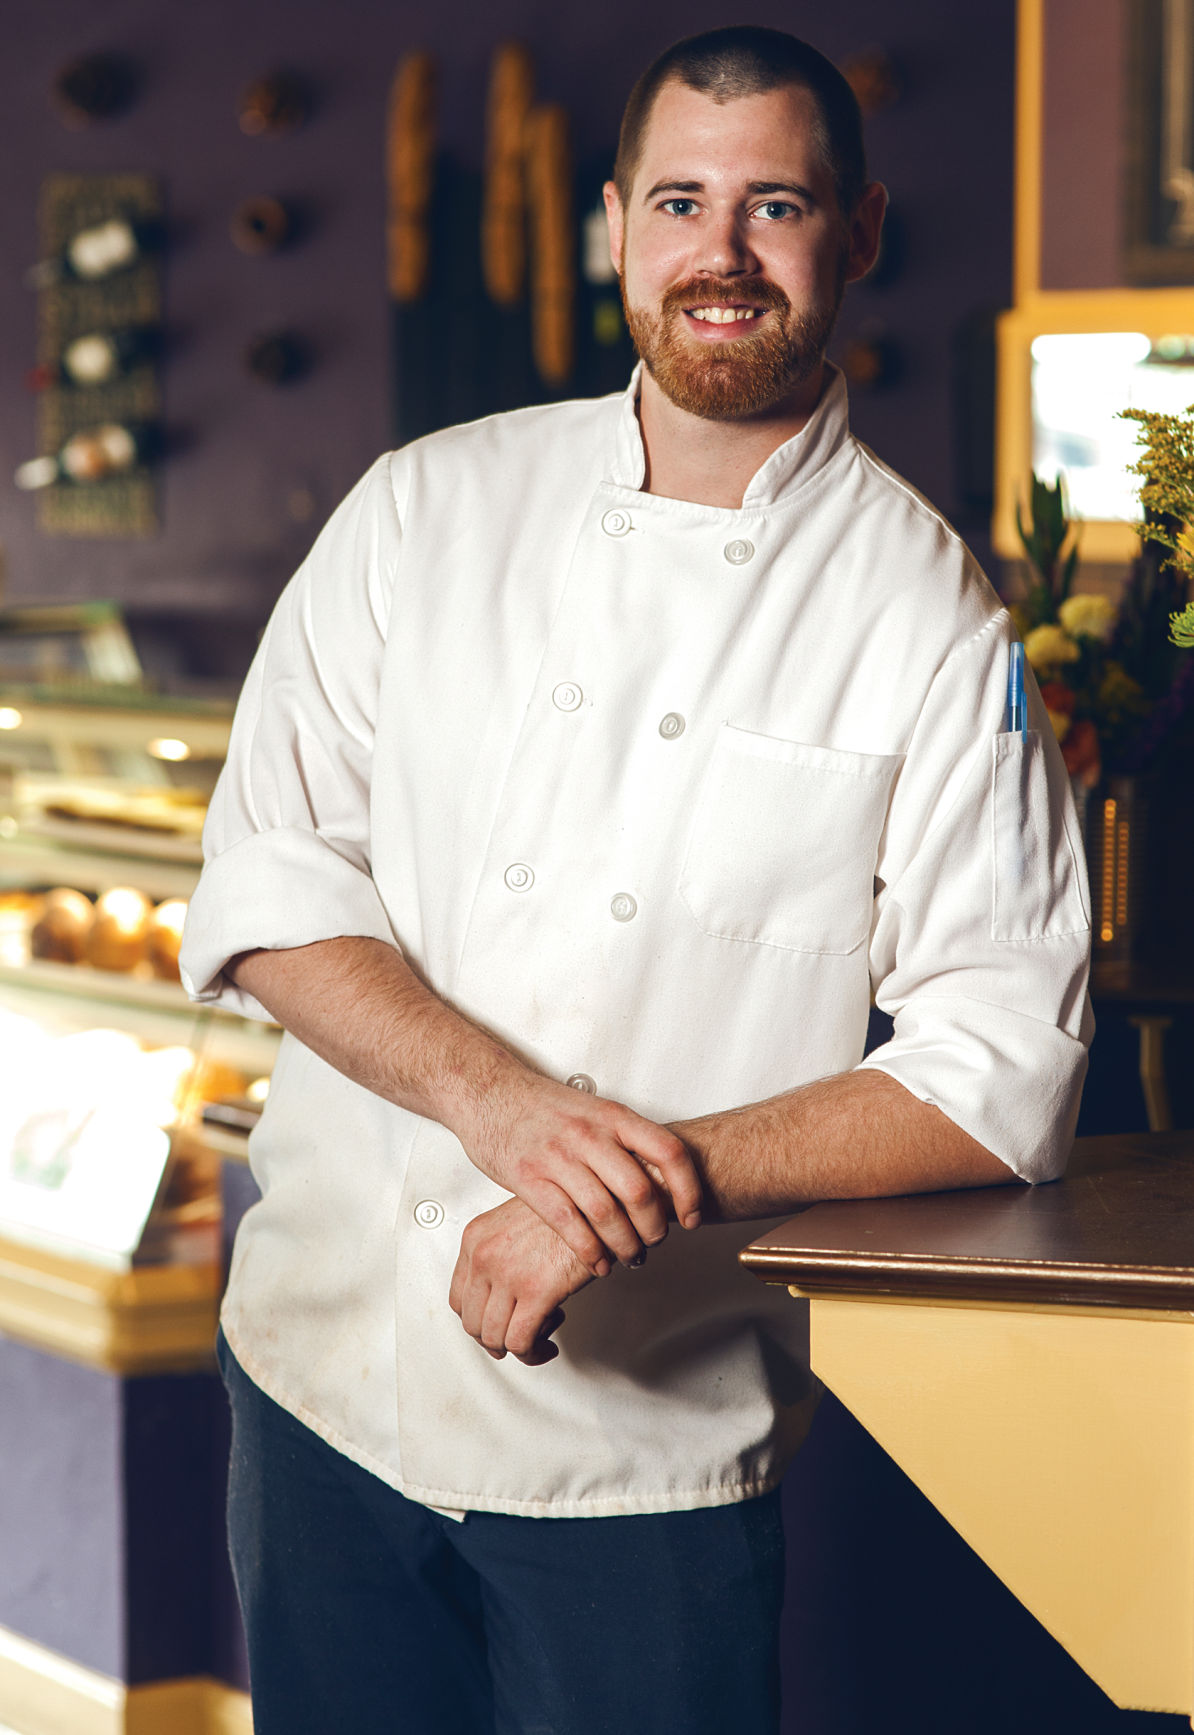 One On One Jon Watkins Executive Chef Baked In Kansas City